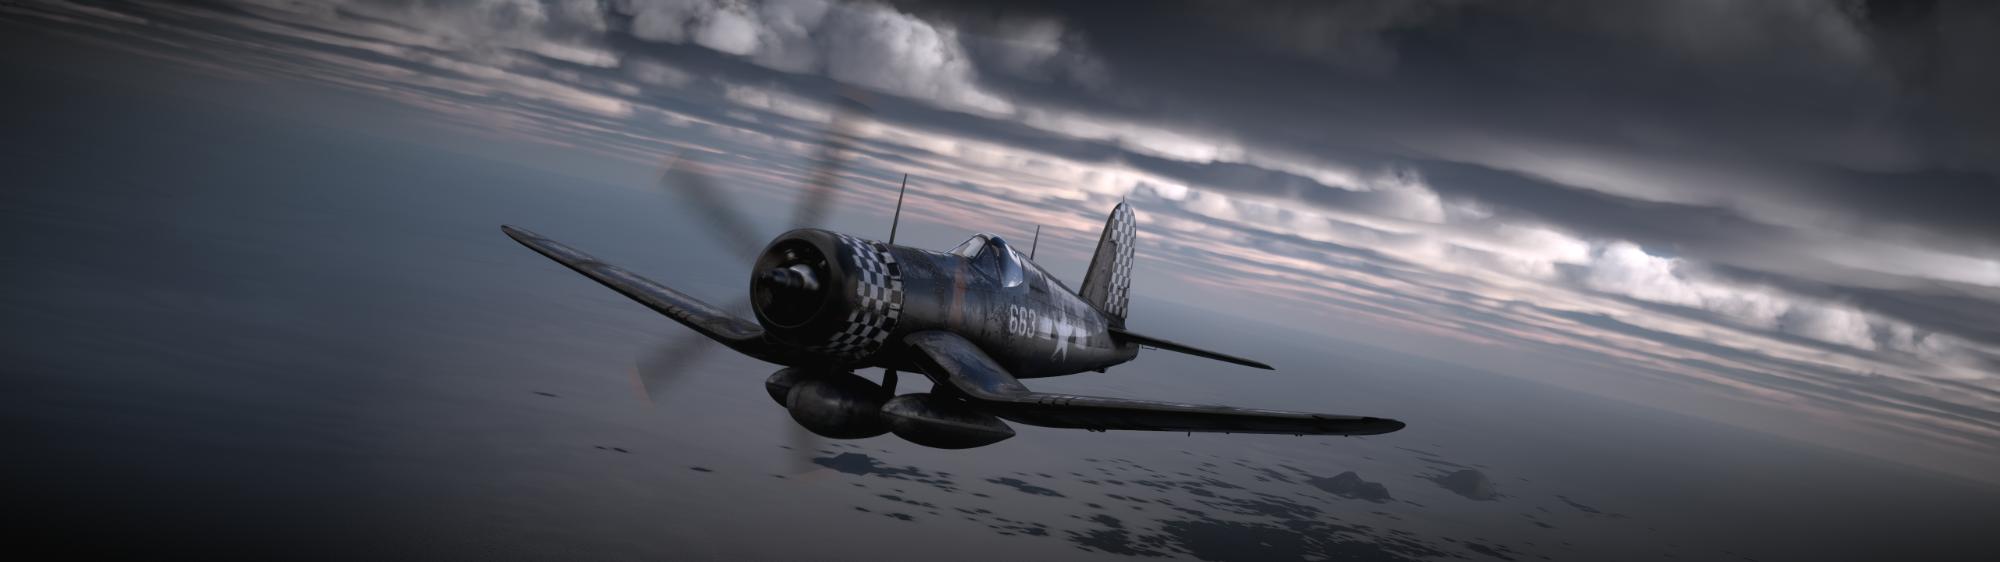 Microsoft Flight Simulator - 1.18.15.0 9_2_2021 7_26_39 PM.png